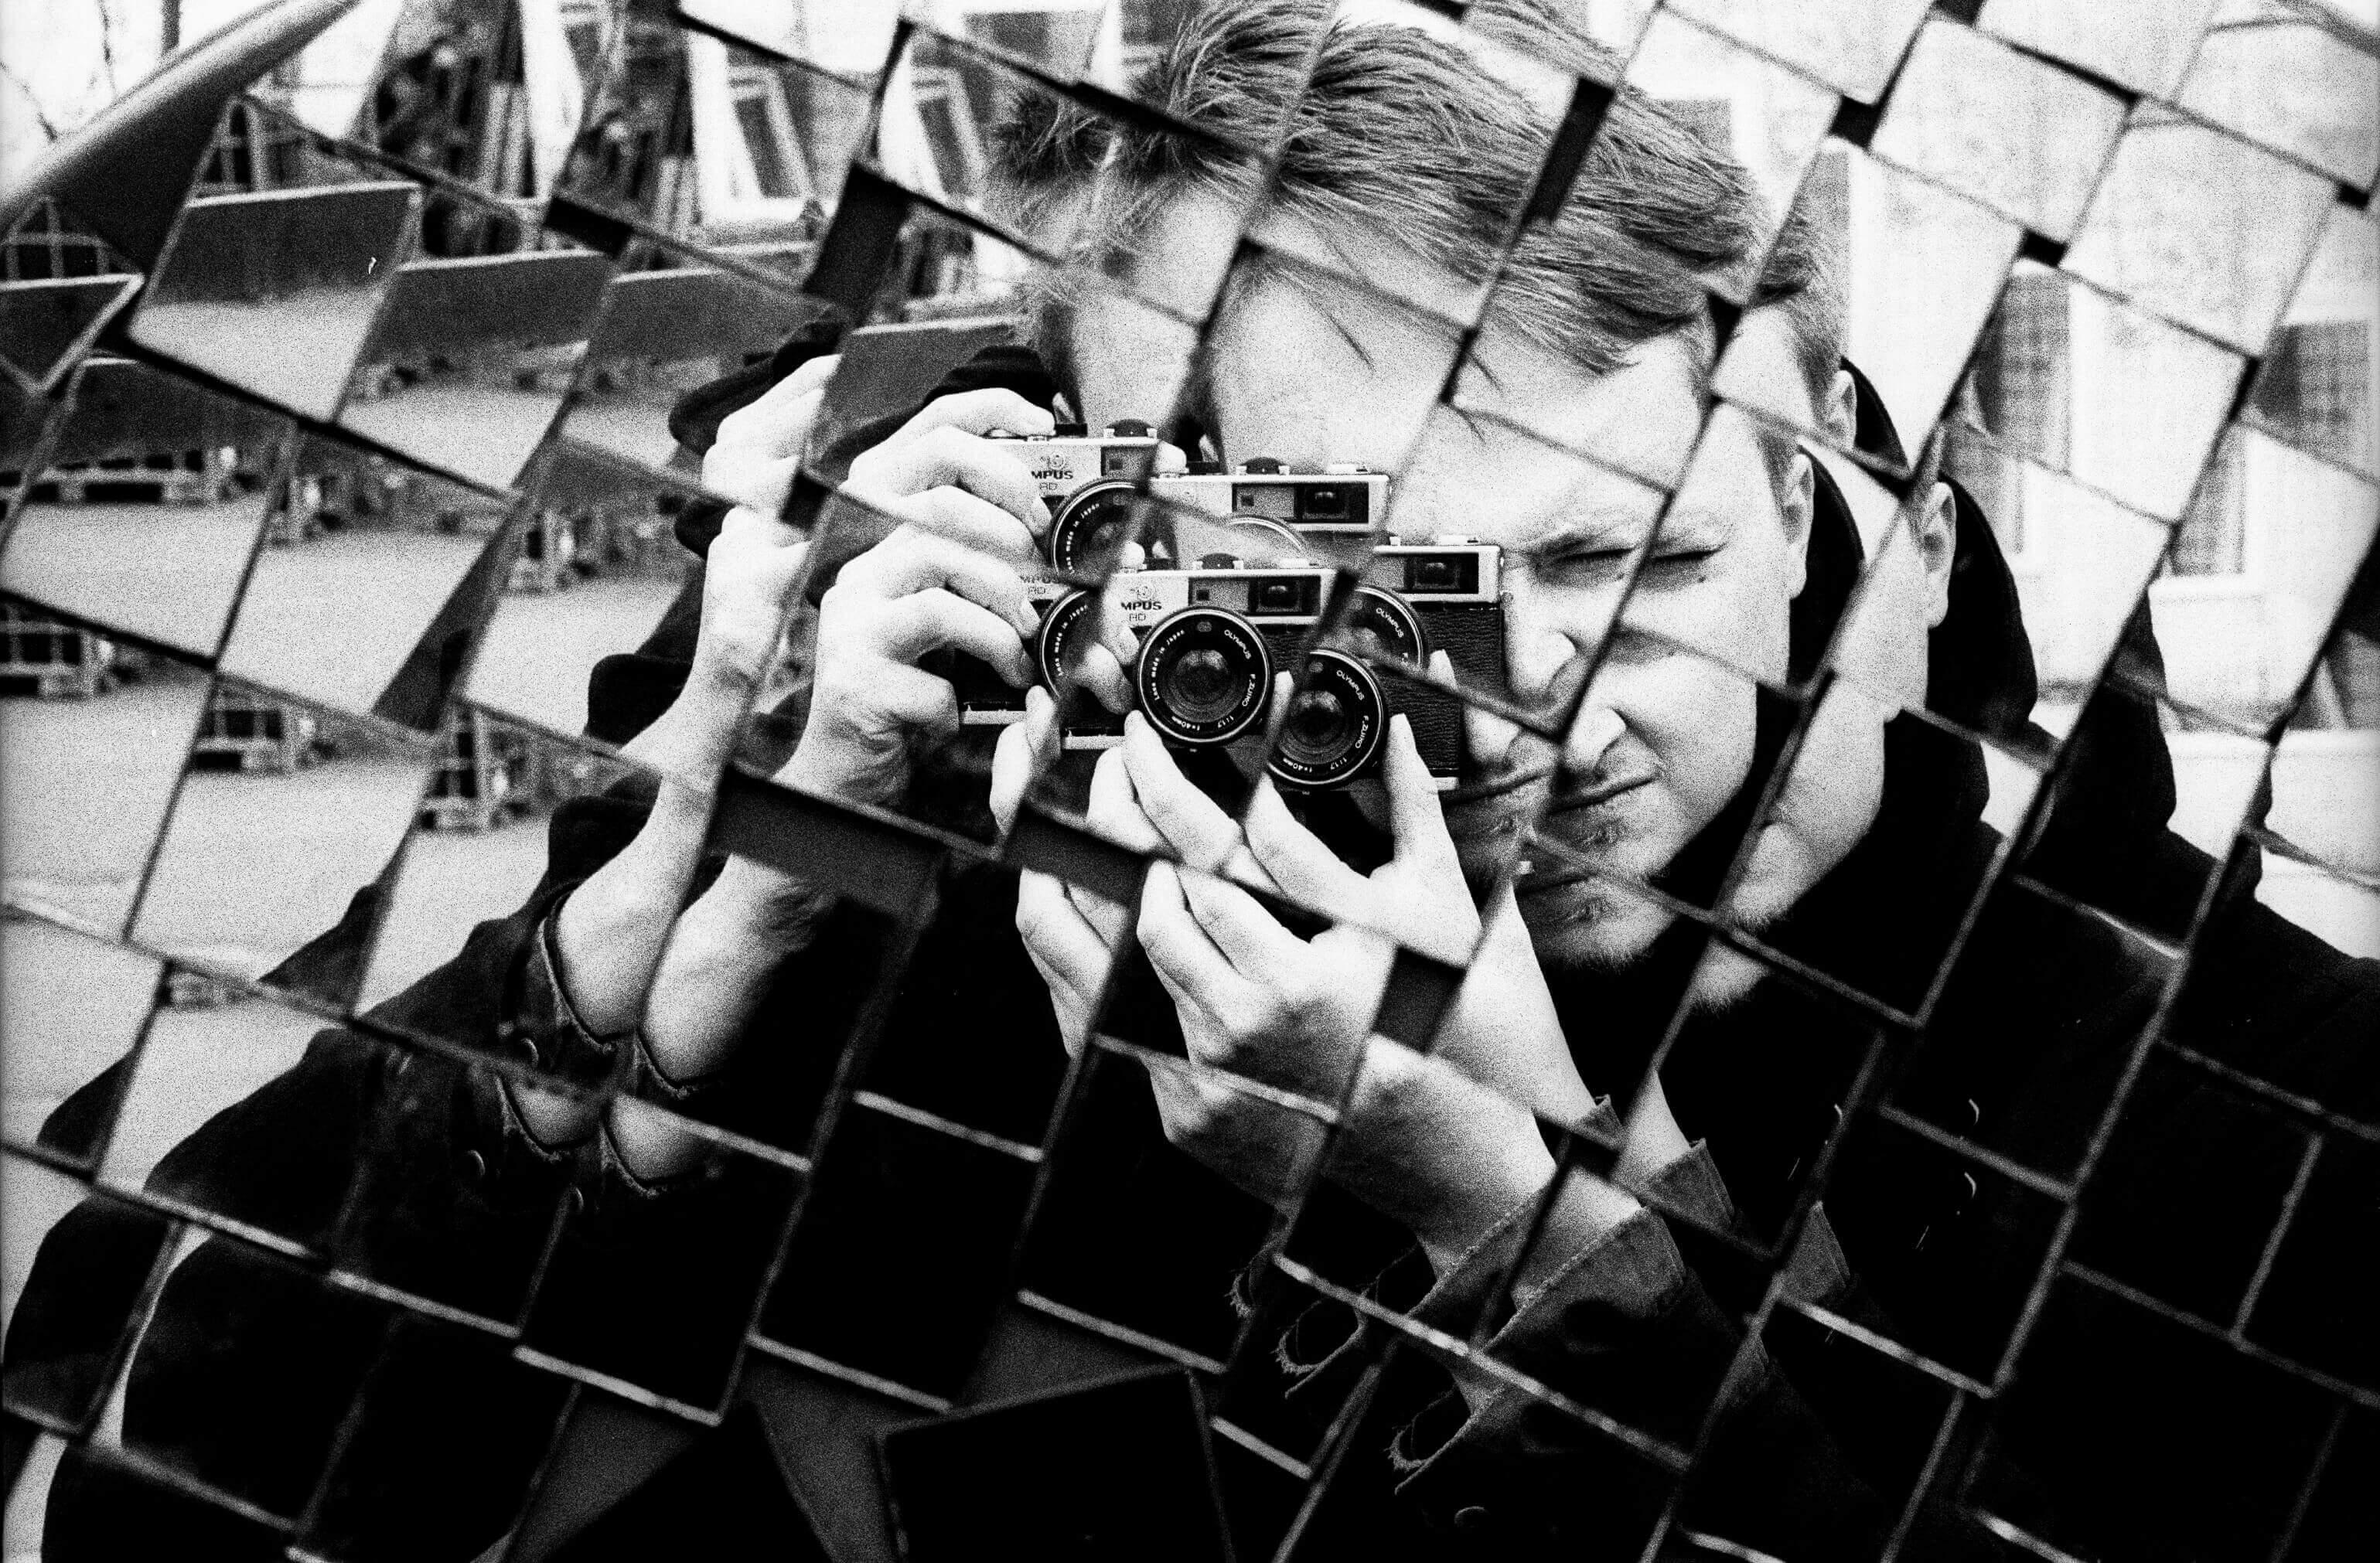 reflection of a man wtih camera